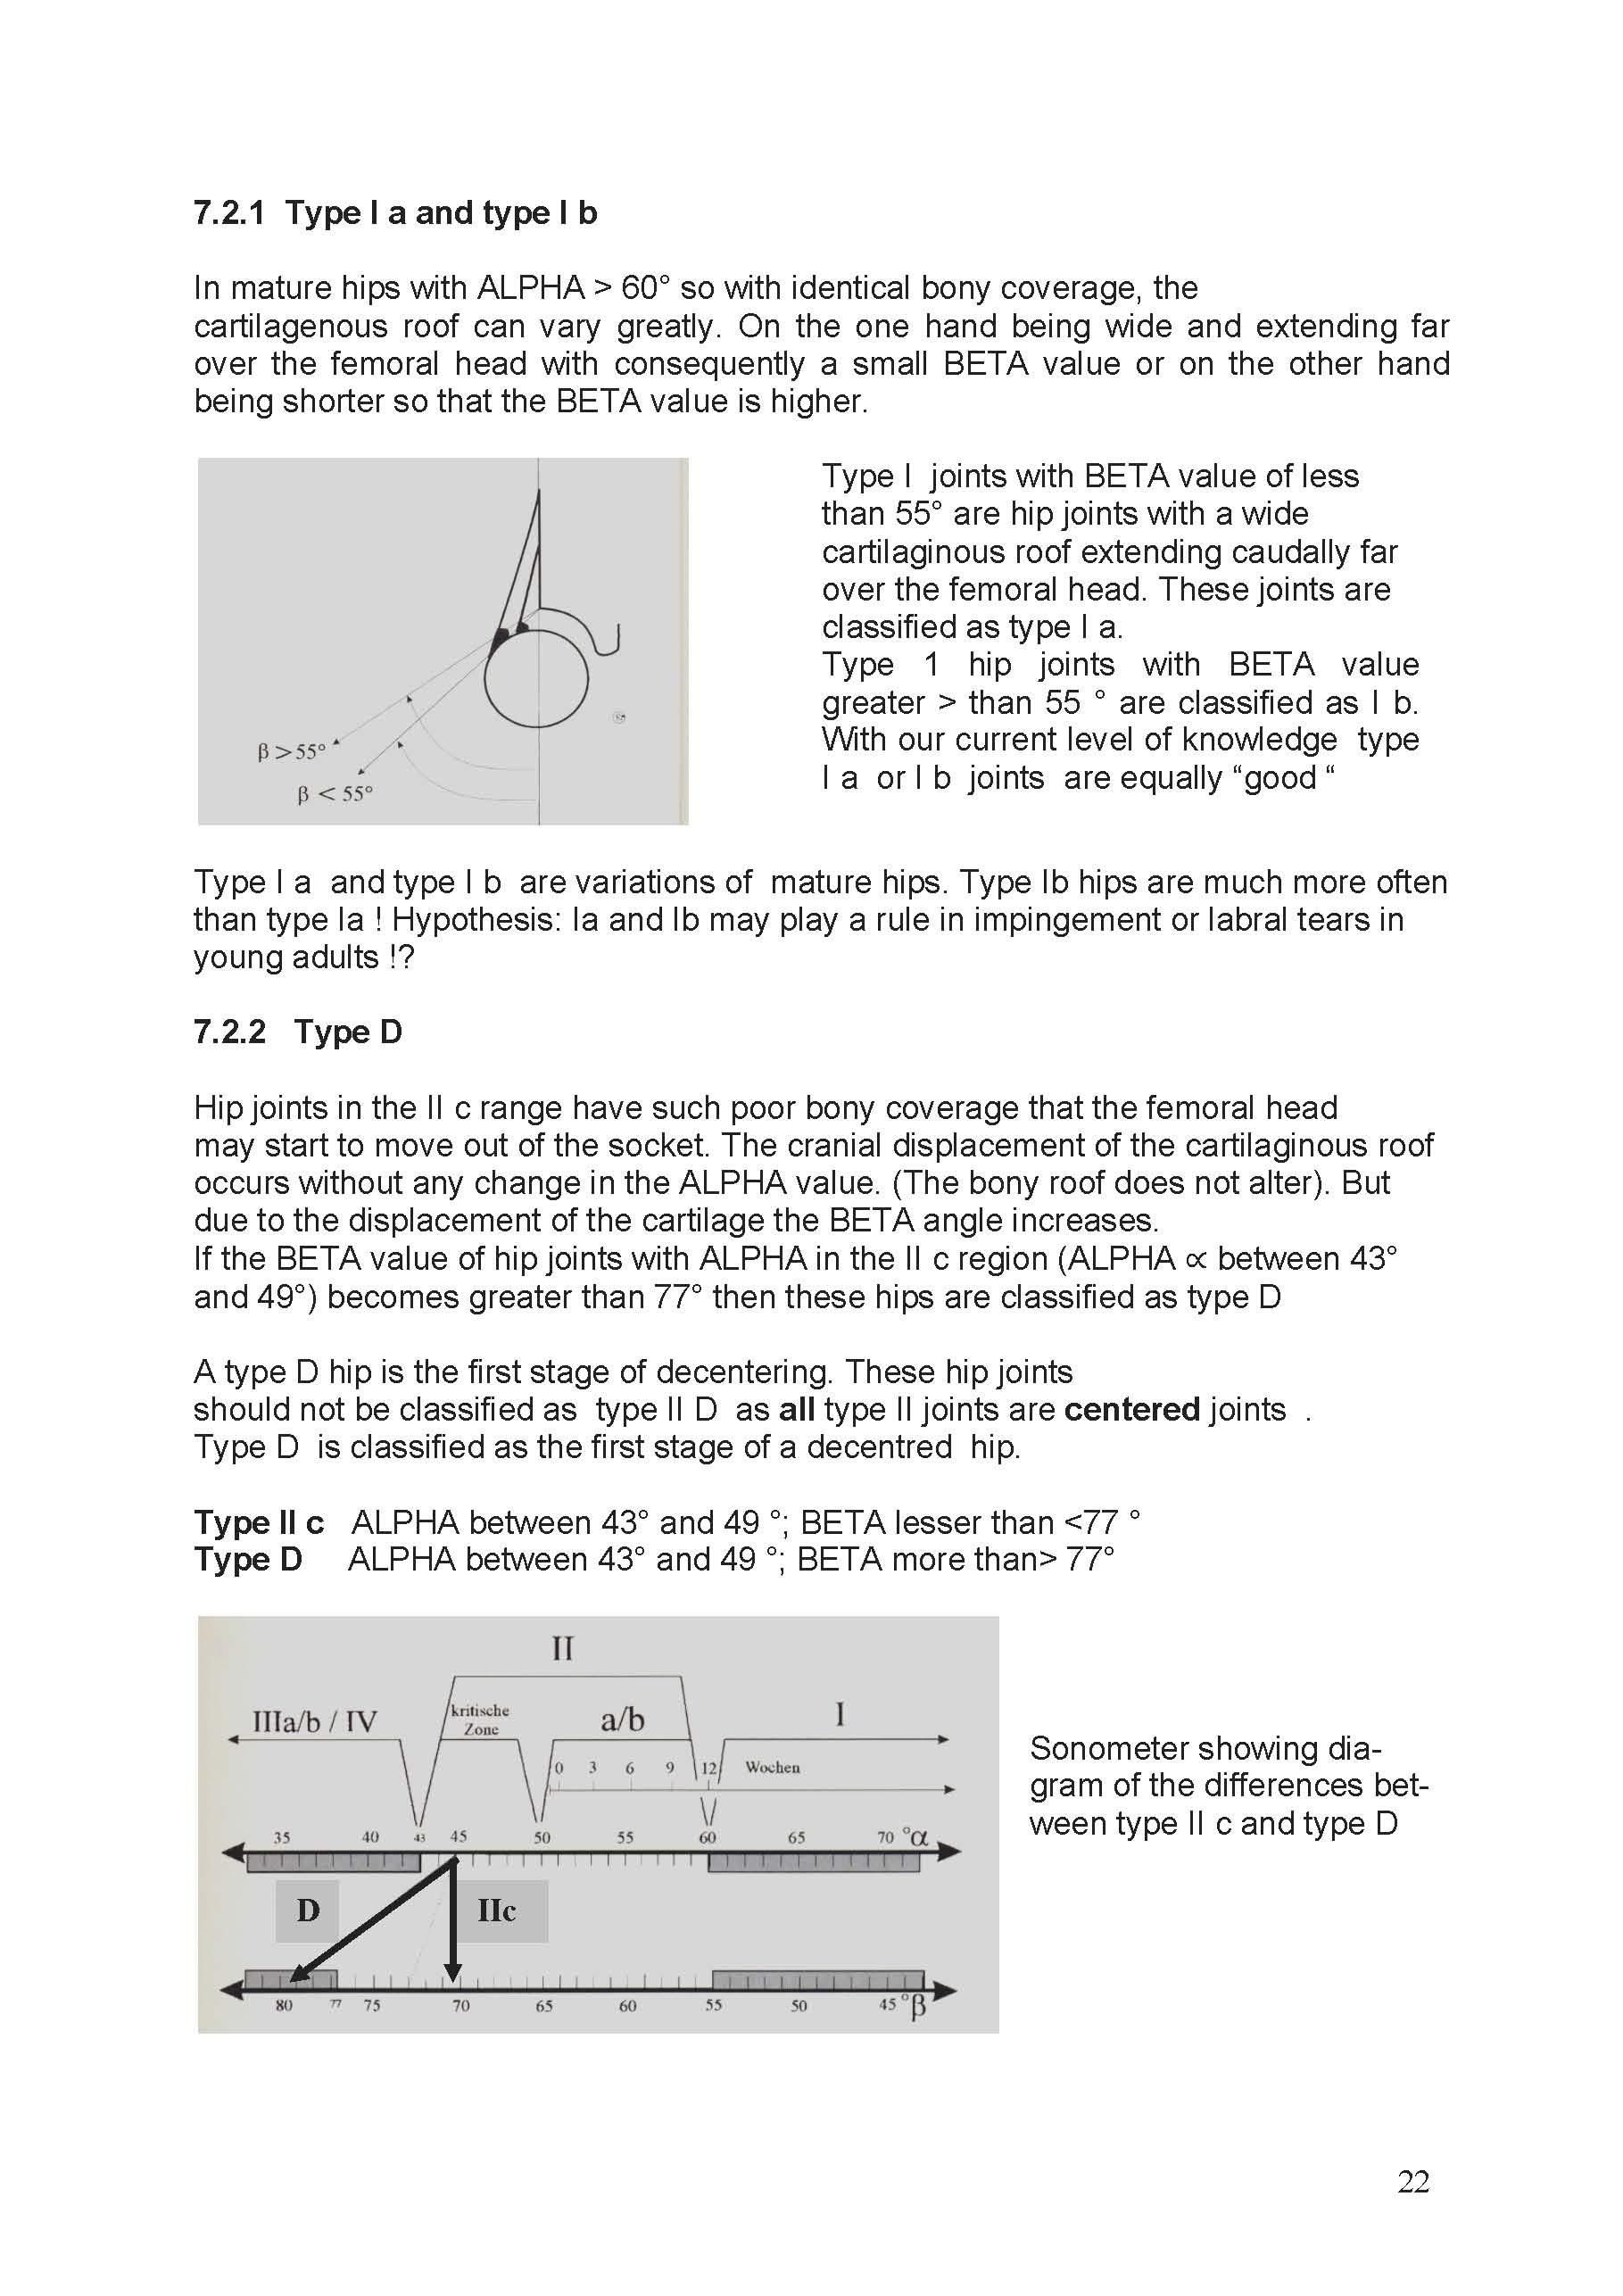 https://0501.nccdn.net/4_2/000/000/057/fca/ManualHip-Sonography--Ma_rz-2017-1_Seite_22-1819x2573.jpg